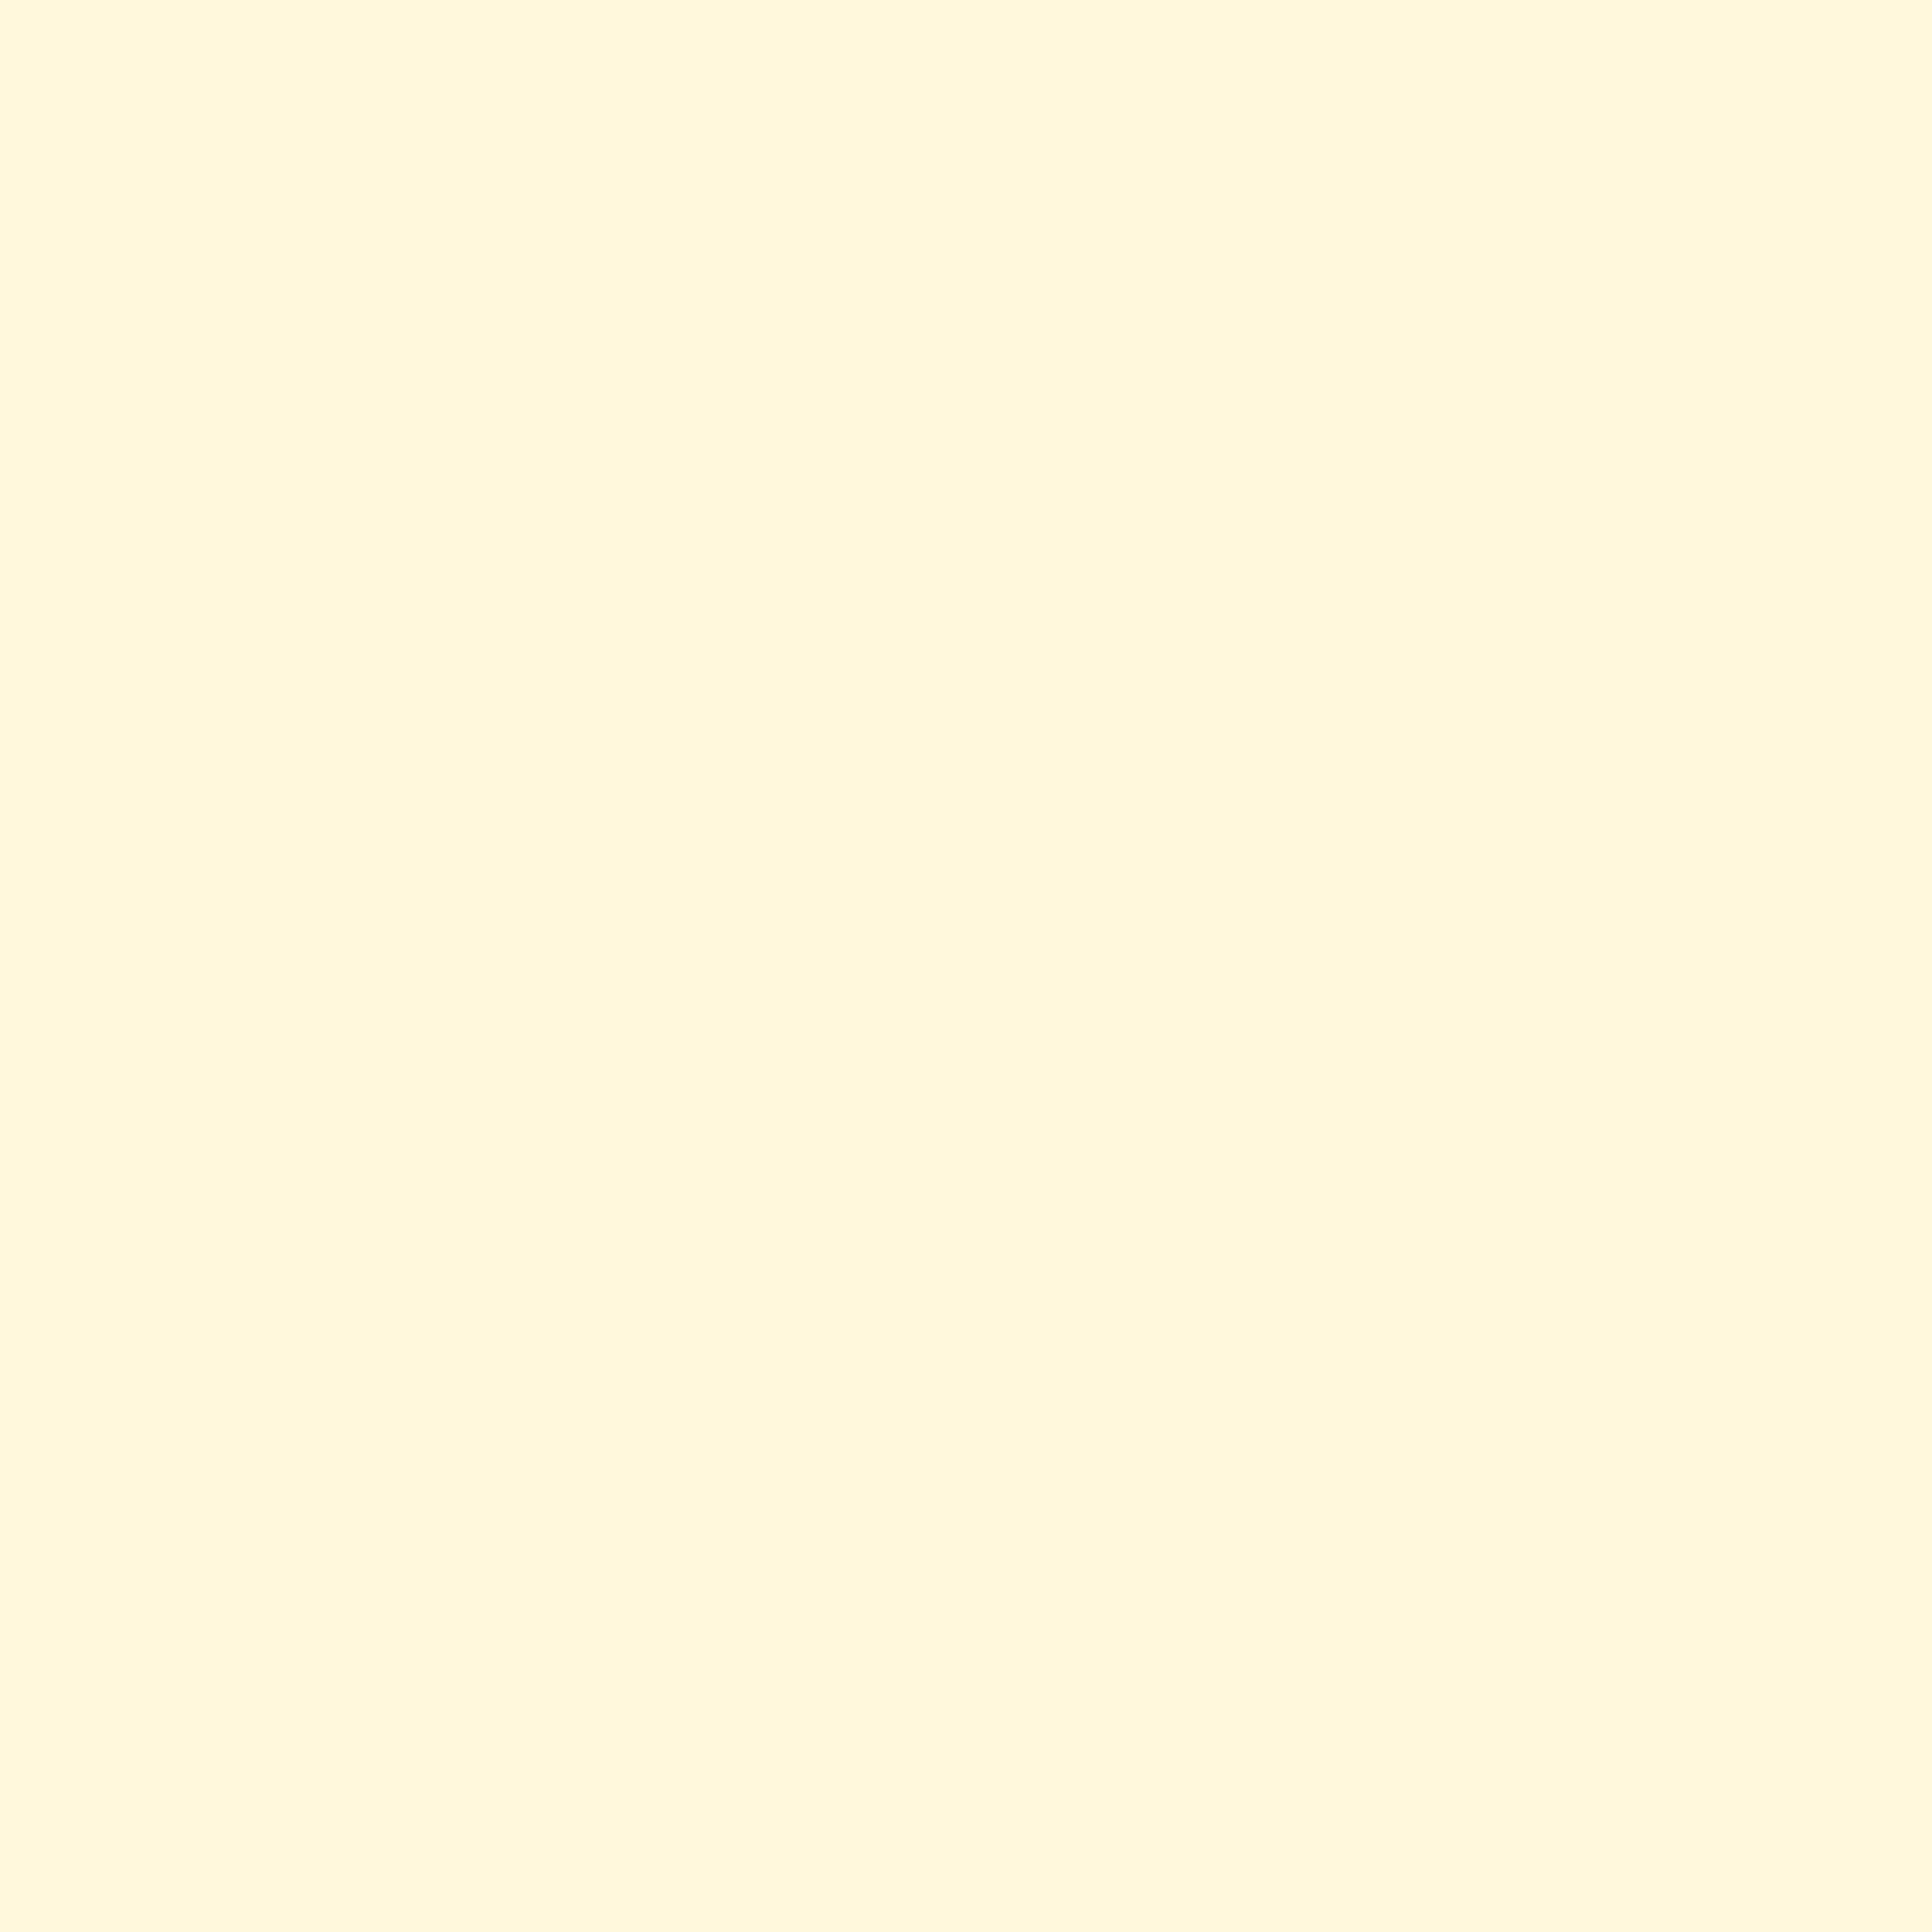 2732x2732 Cornsilk Solid Color Background